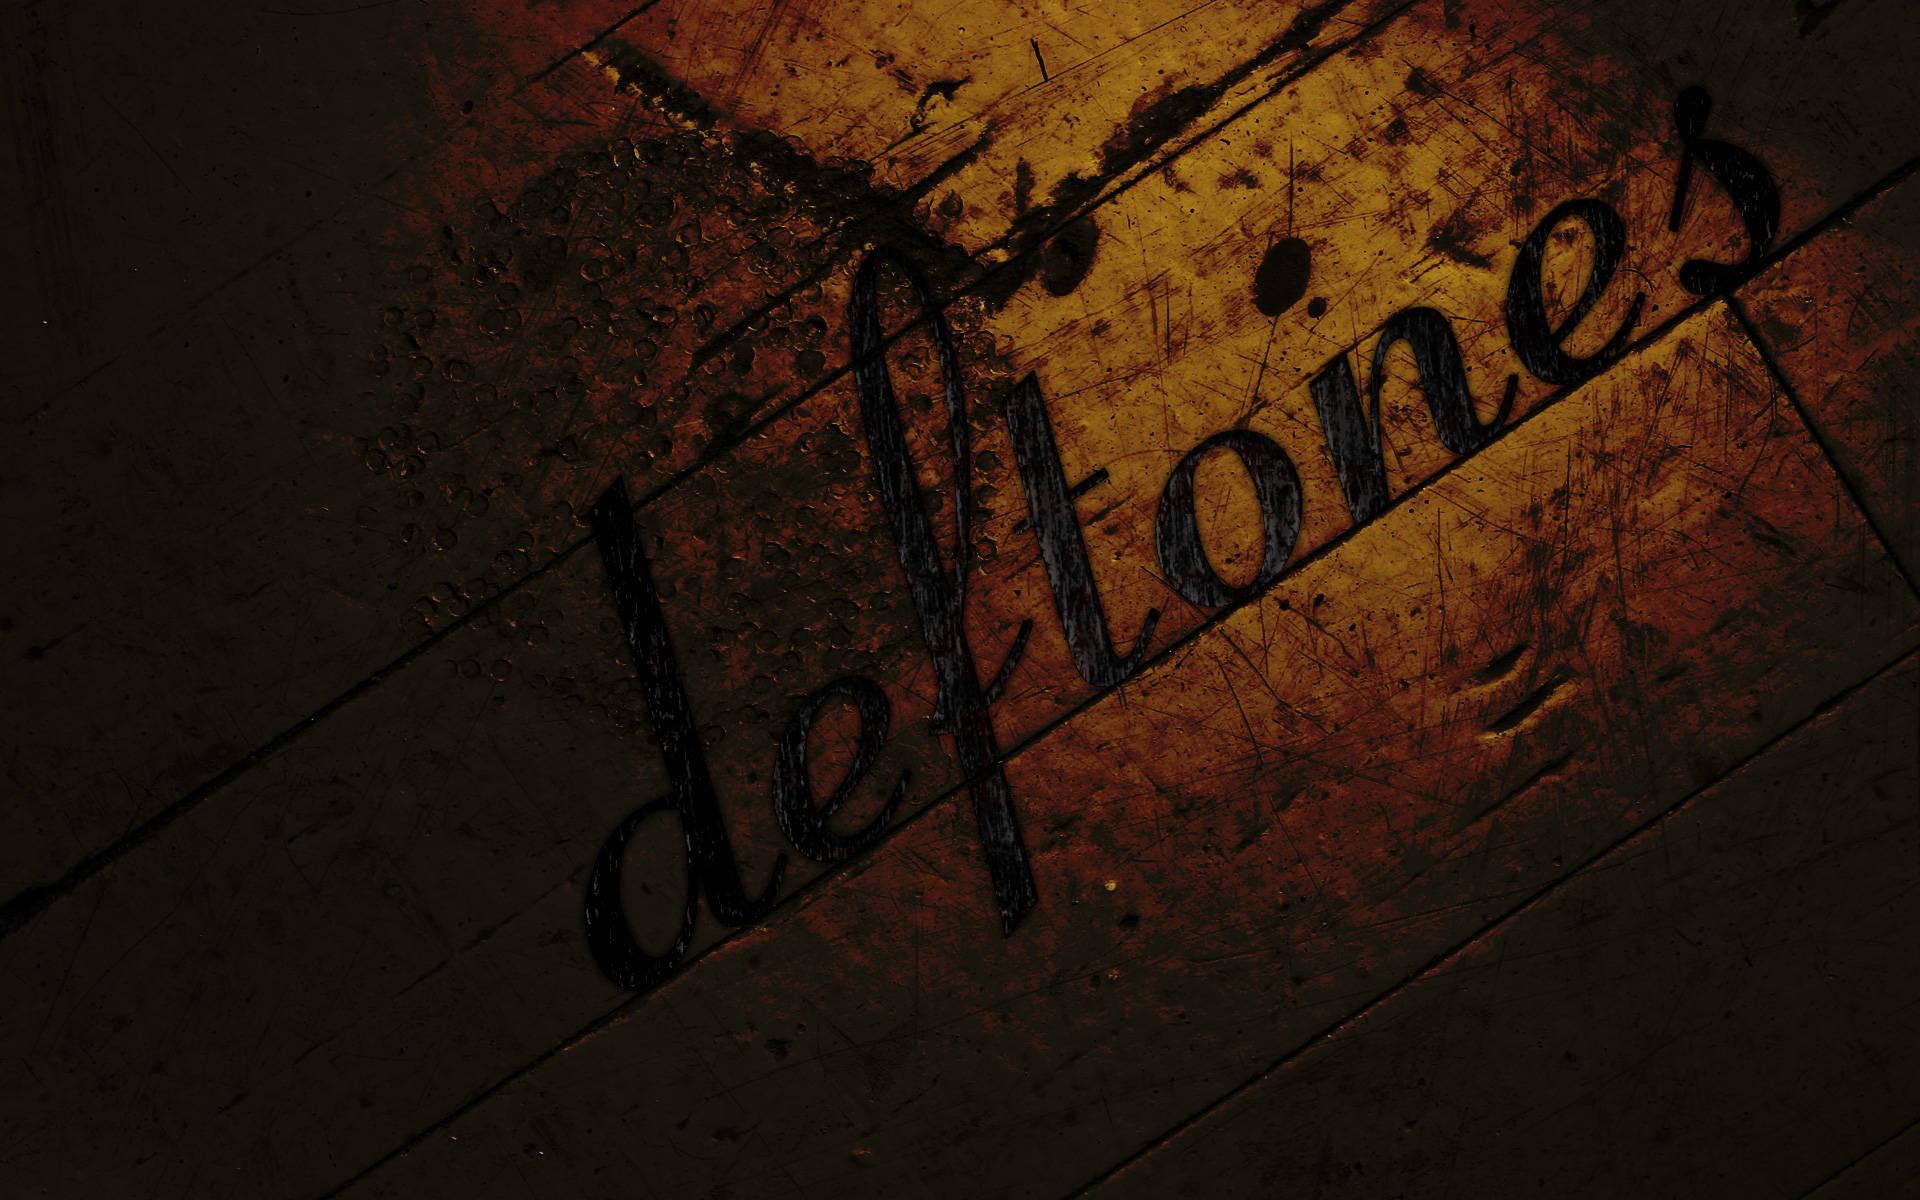 Deftones Logo Wallpaper Click To View Pictures 1920x1200